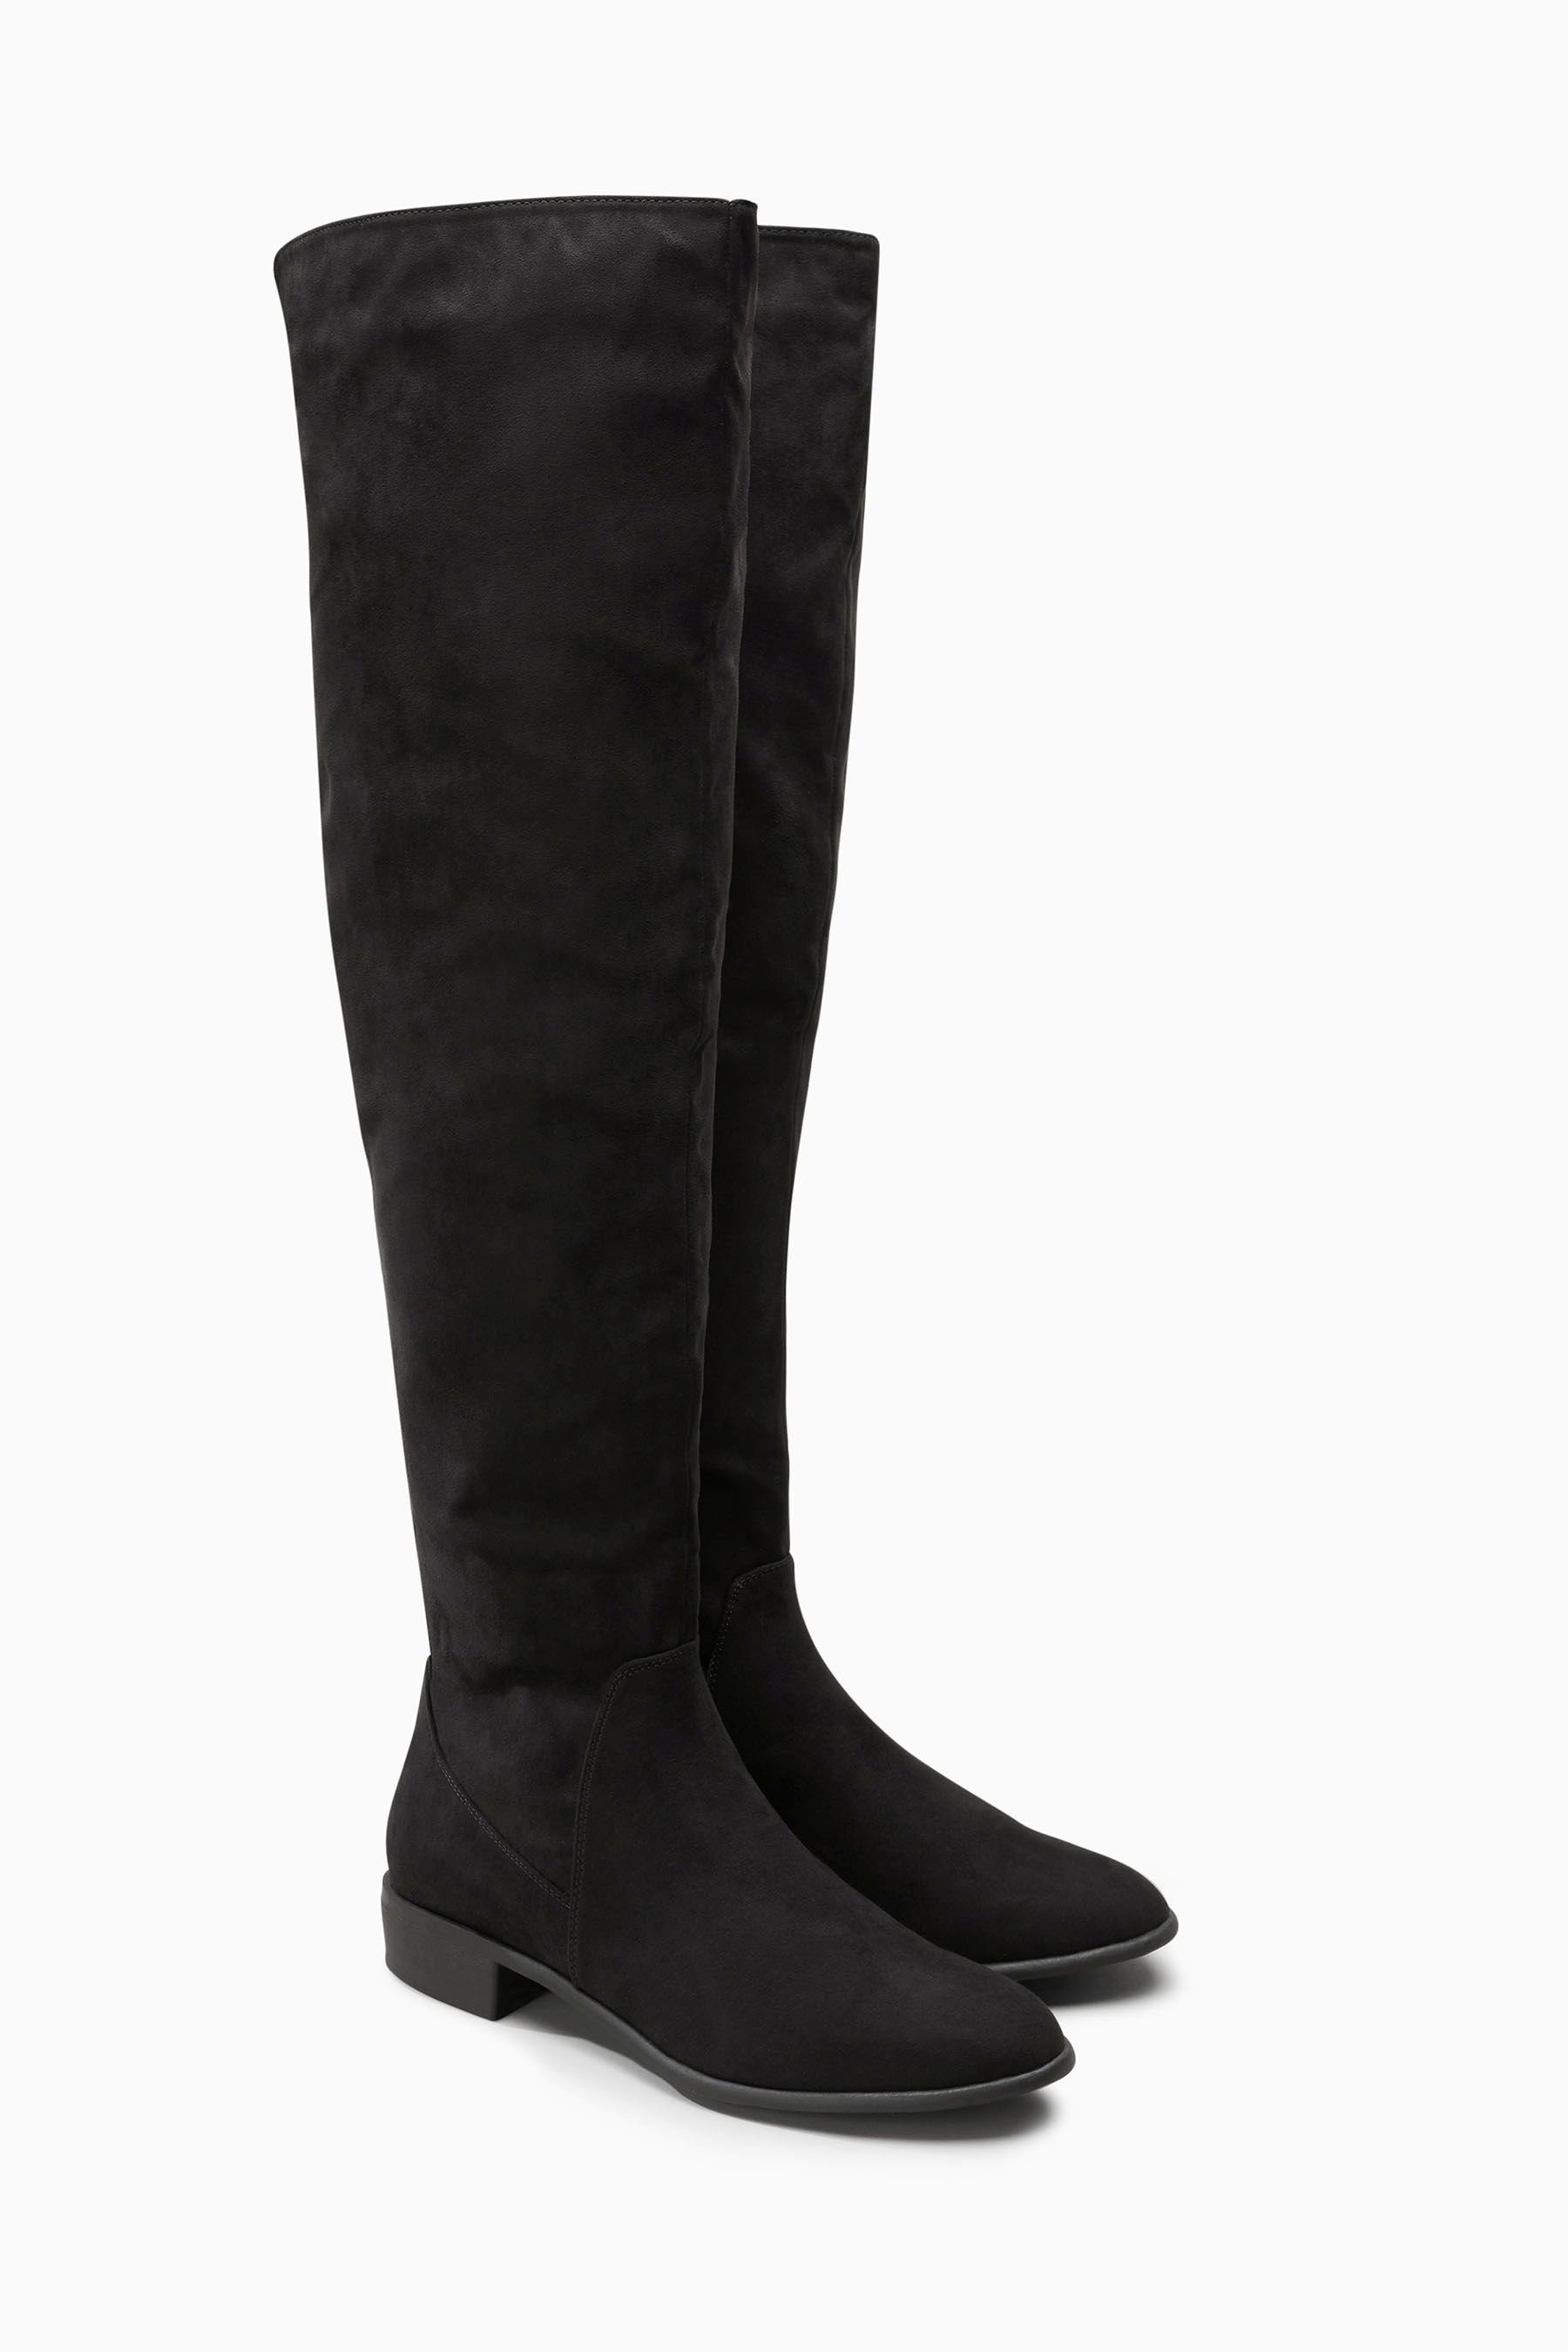 Next Flache Overknee-Stiefel, schwarz, Black